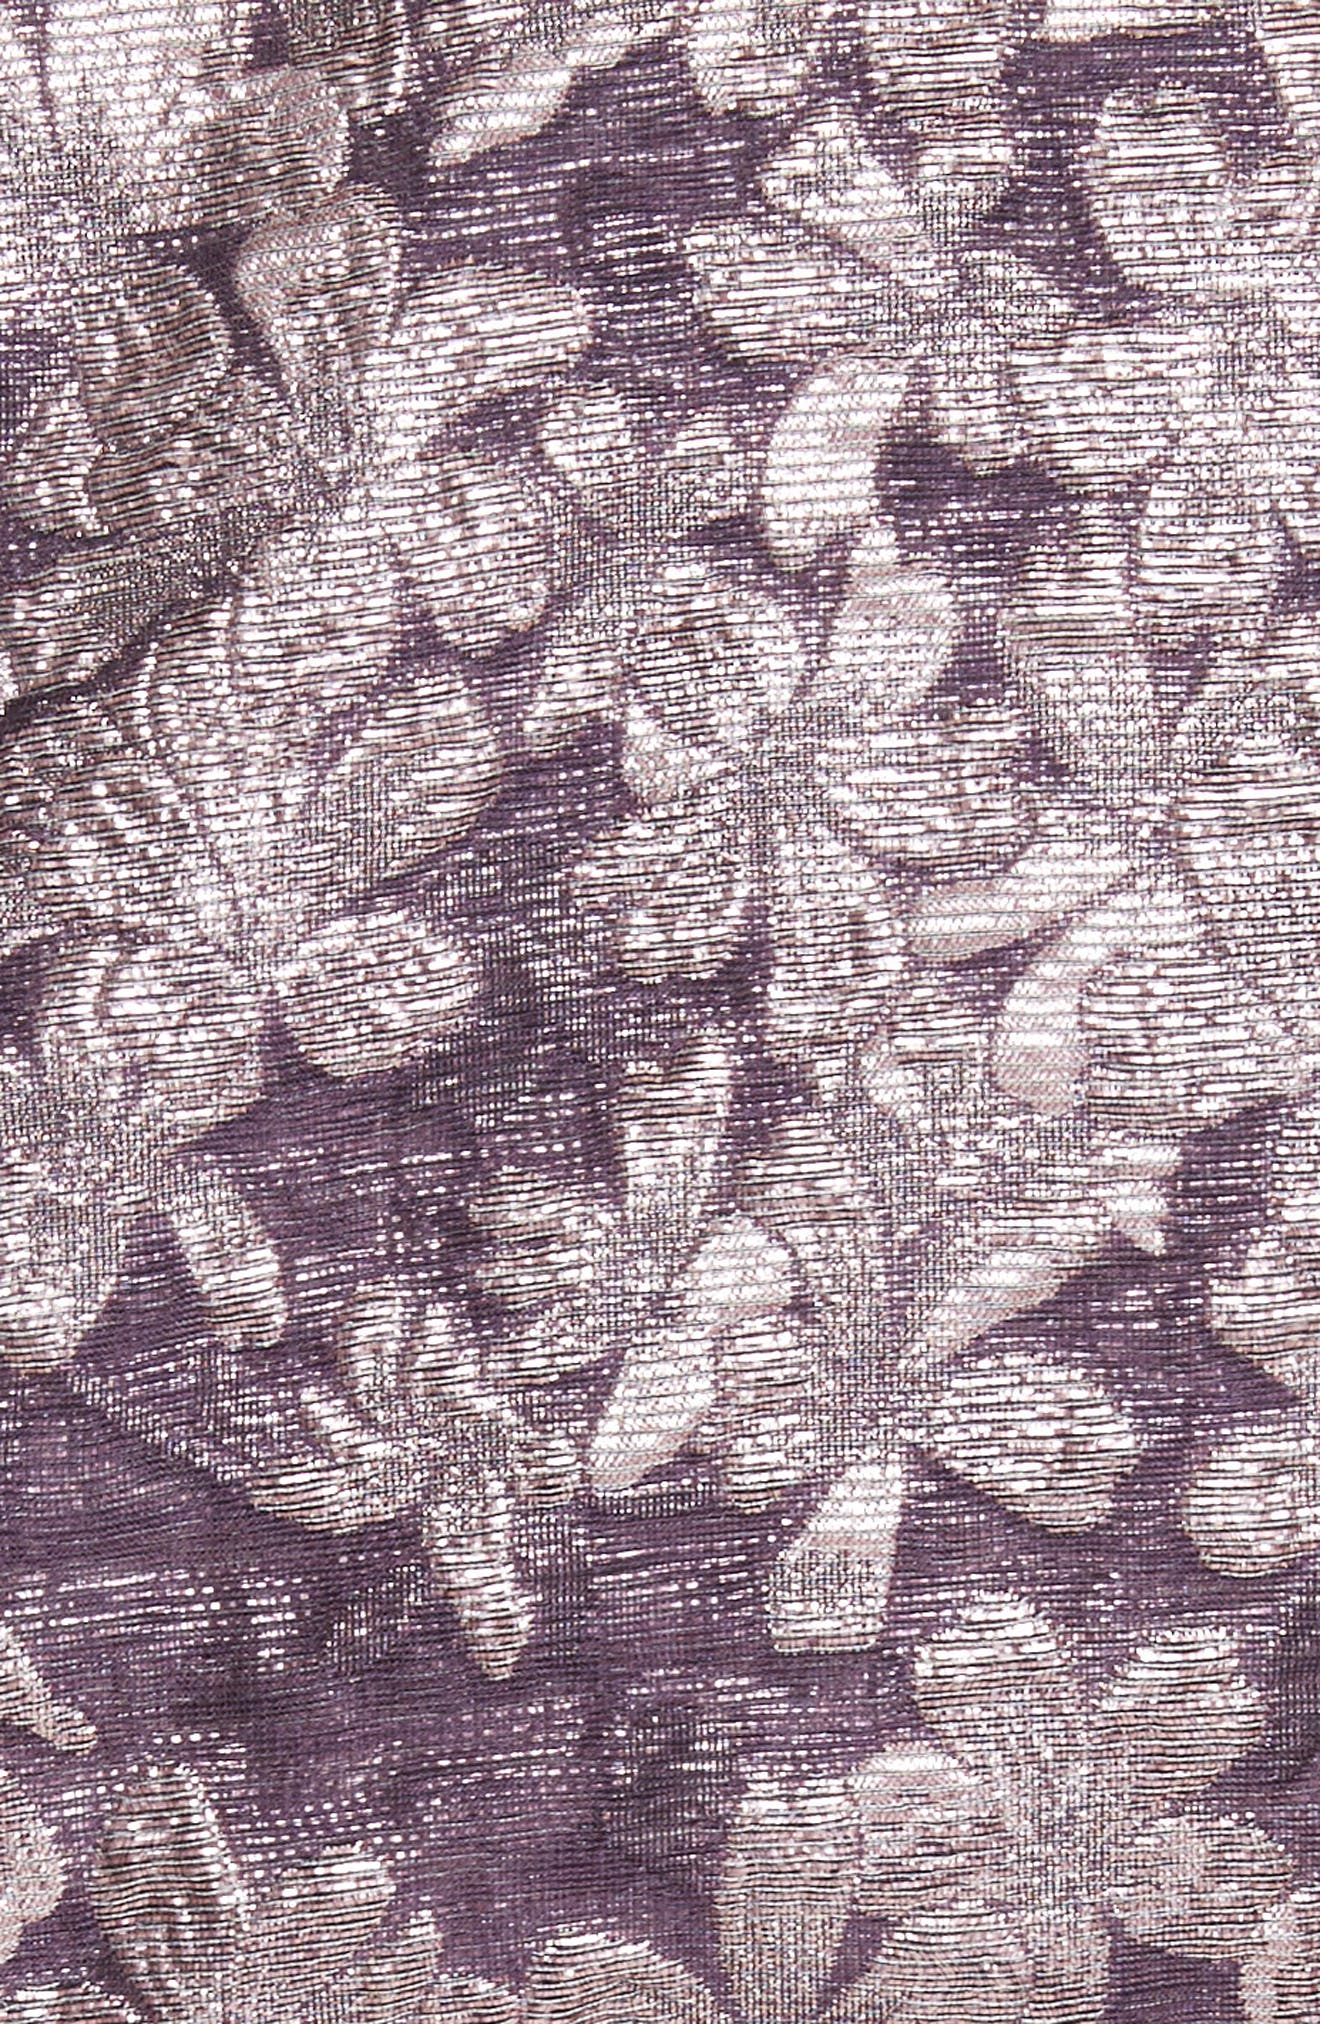 Metallic Floral Jacquard Dress,                             Alternate thumbnail 6, color,                             Orchid Multi